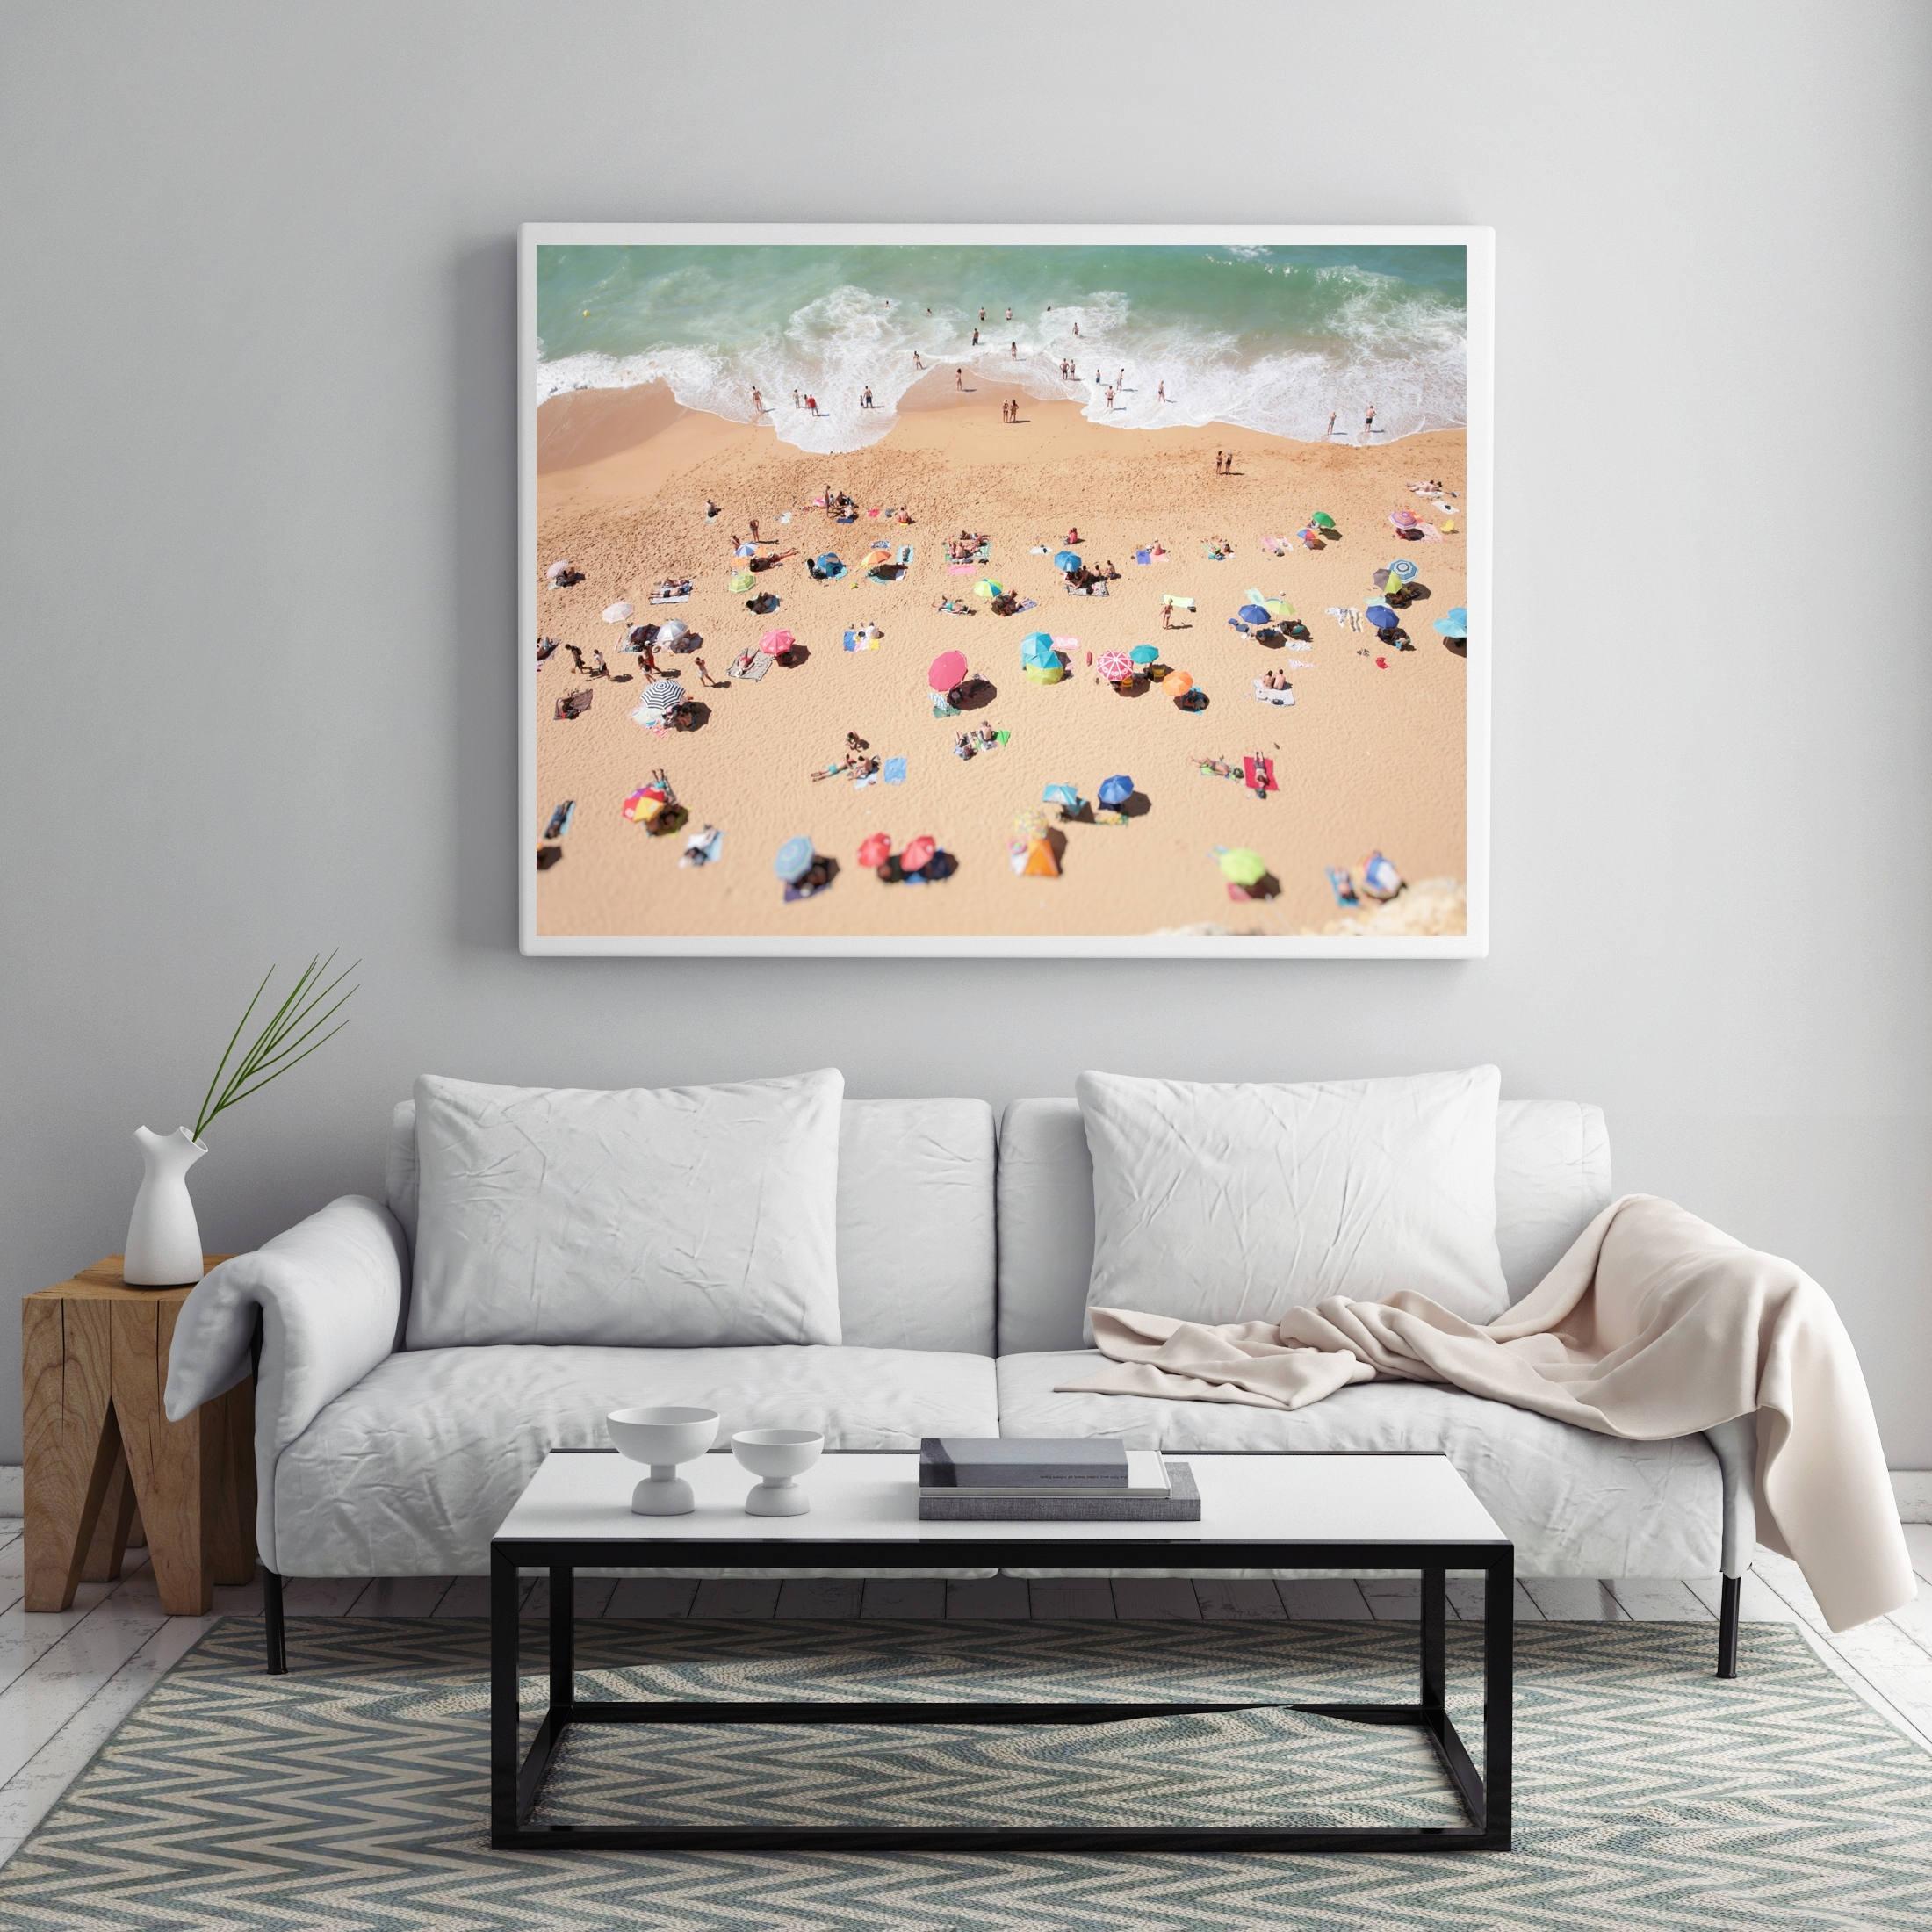 2017 Large Coastal Wall Art Inside Aerial Beach Photo, People On The Beach, Modern Wall Art, Beach (View 8 of 15)